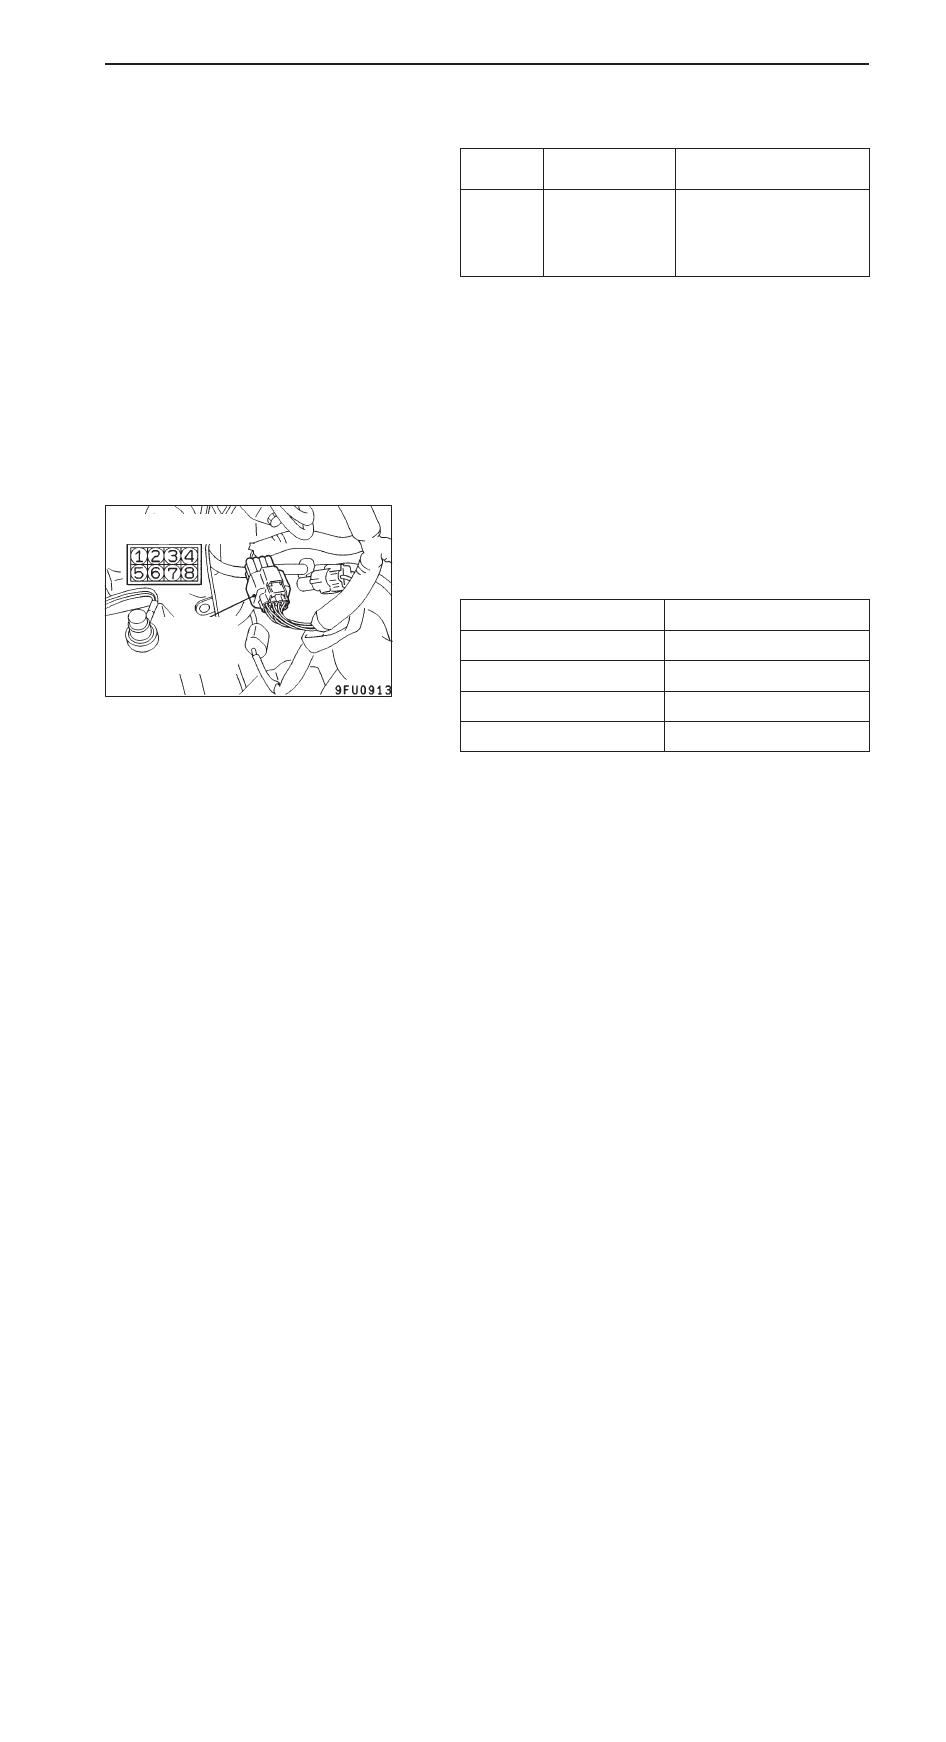 mitsubishi pajero pinin manual part 60 rh zinref ru